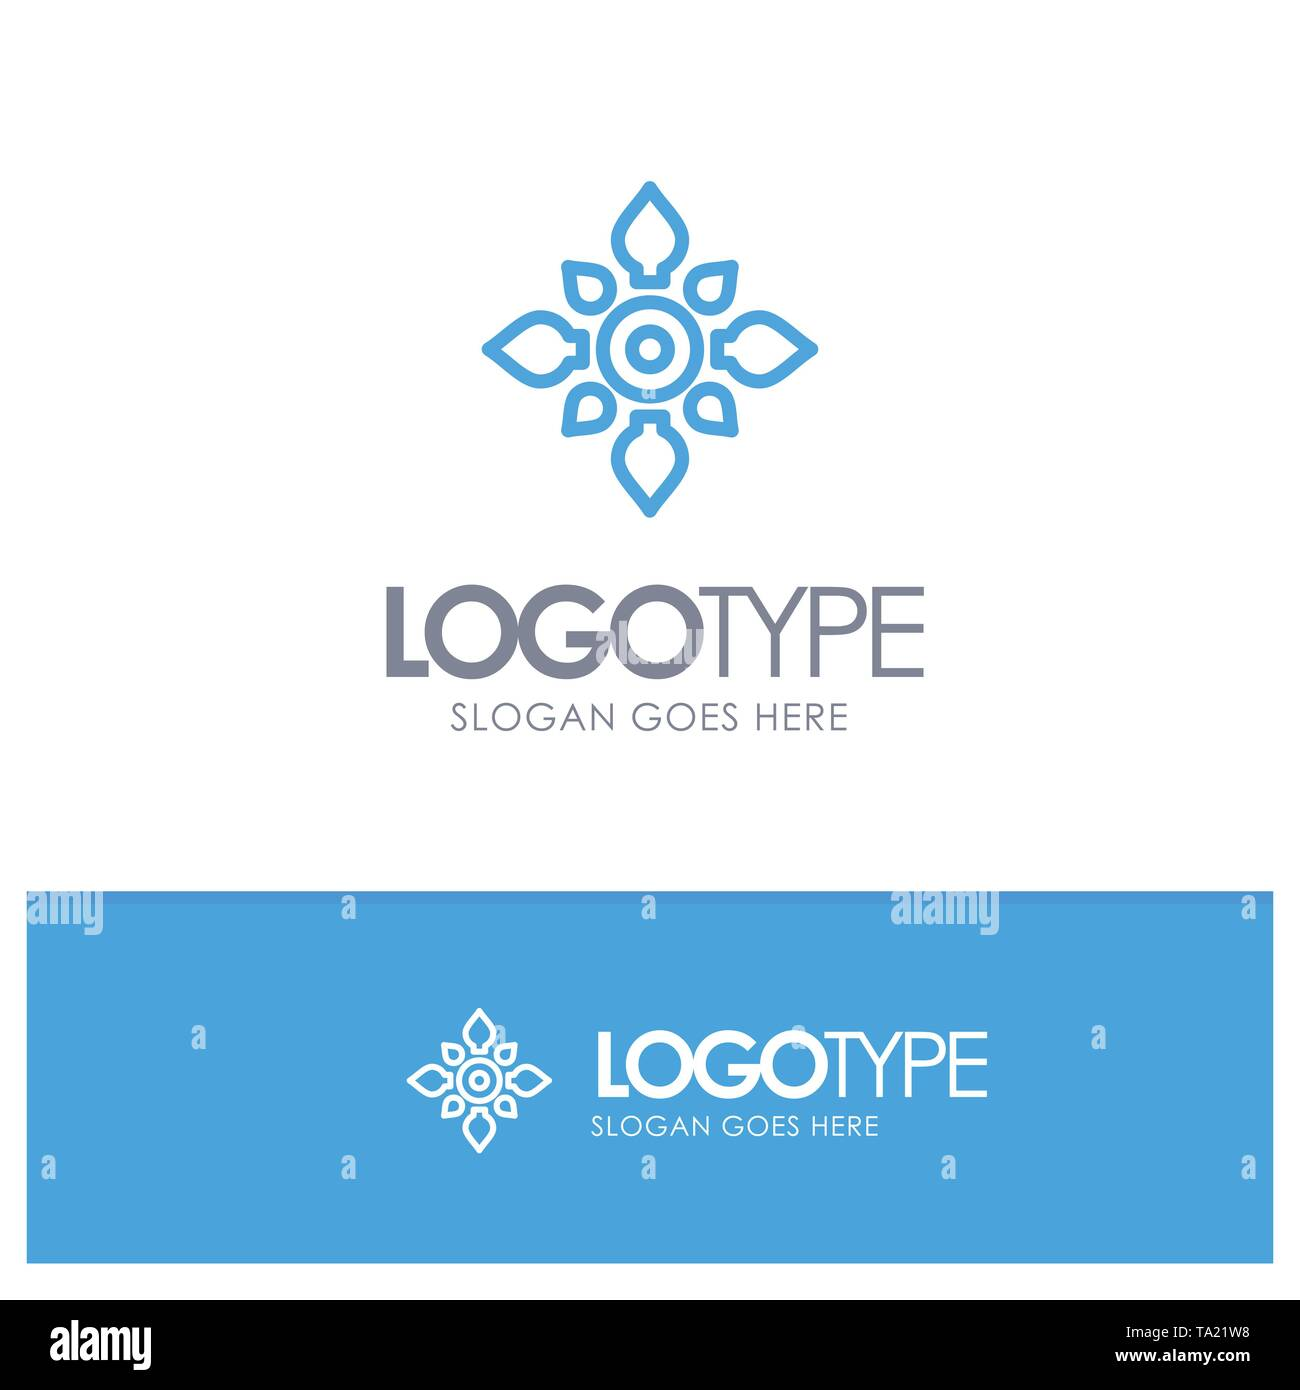 Celebrate, Decorate, Decoration, Diwali, Hindu, Holi Blue Outline Logo Place for Tagline - Stock Image